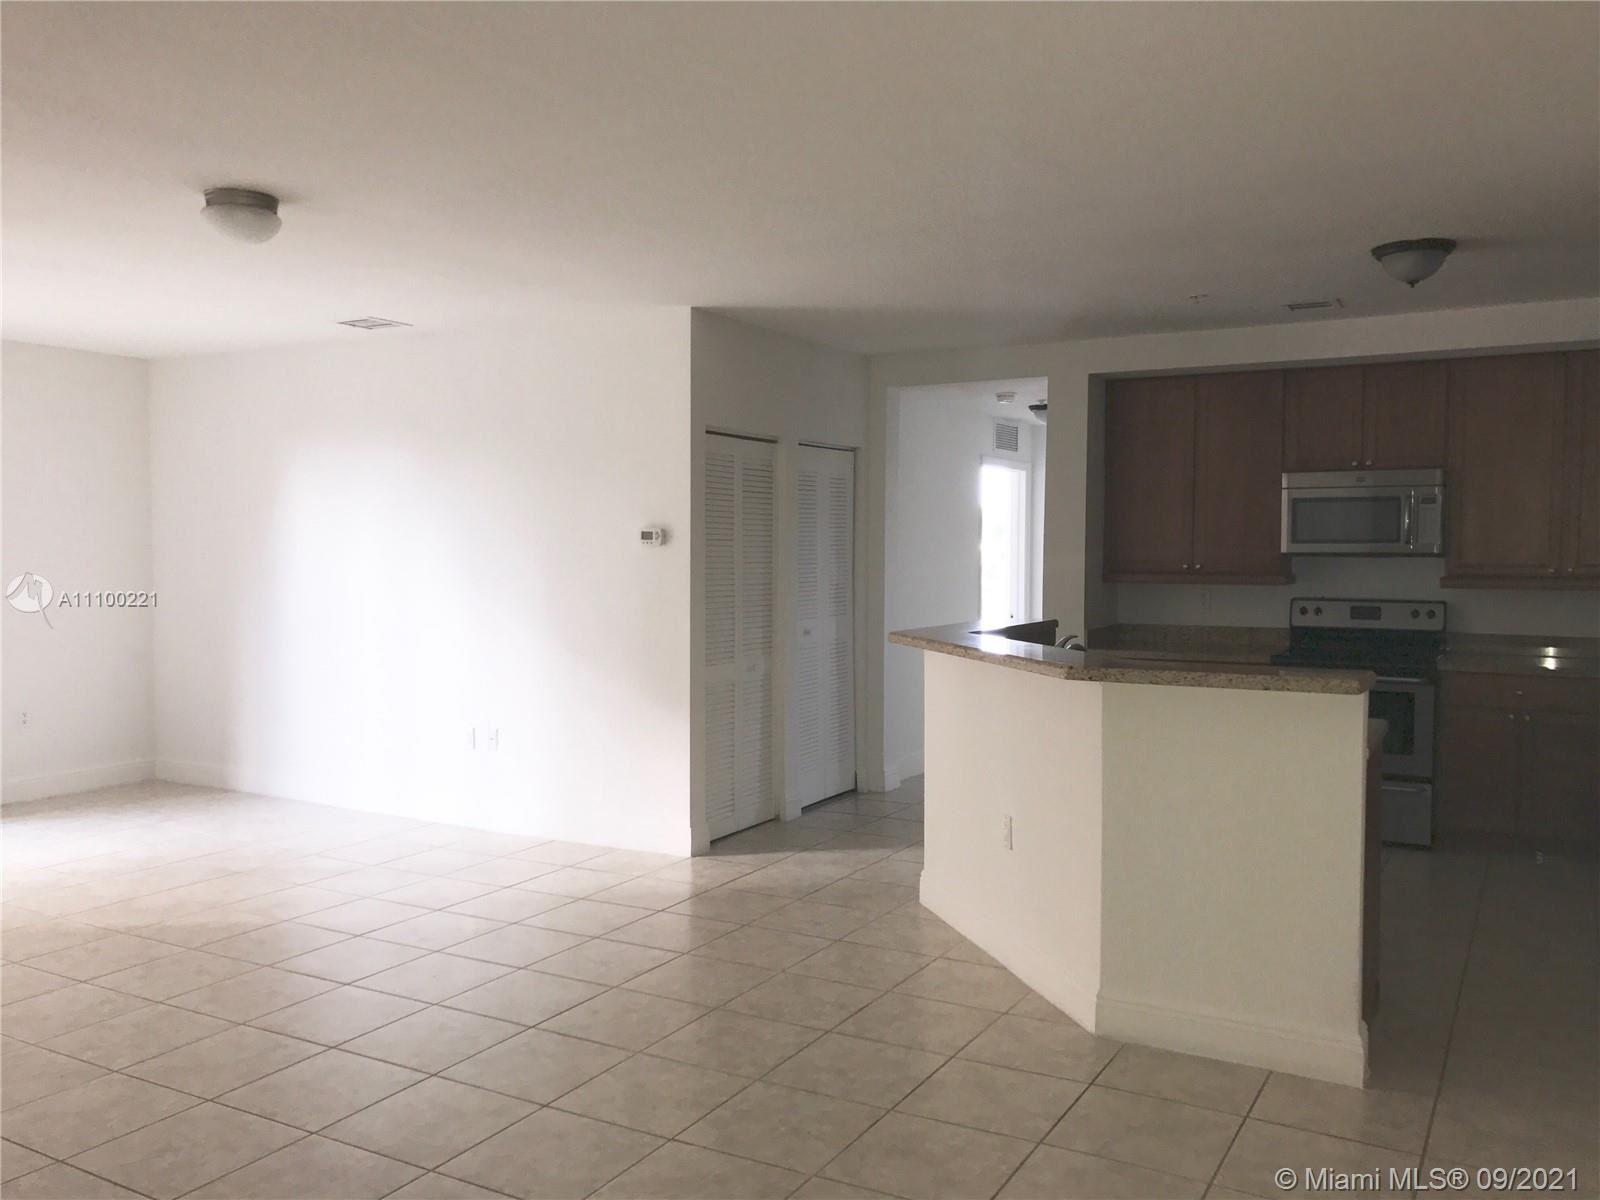 Photo of 107 Mendoza Ave #205, Coral Gables, FL 33134 (MLS # A11100221)